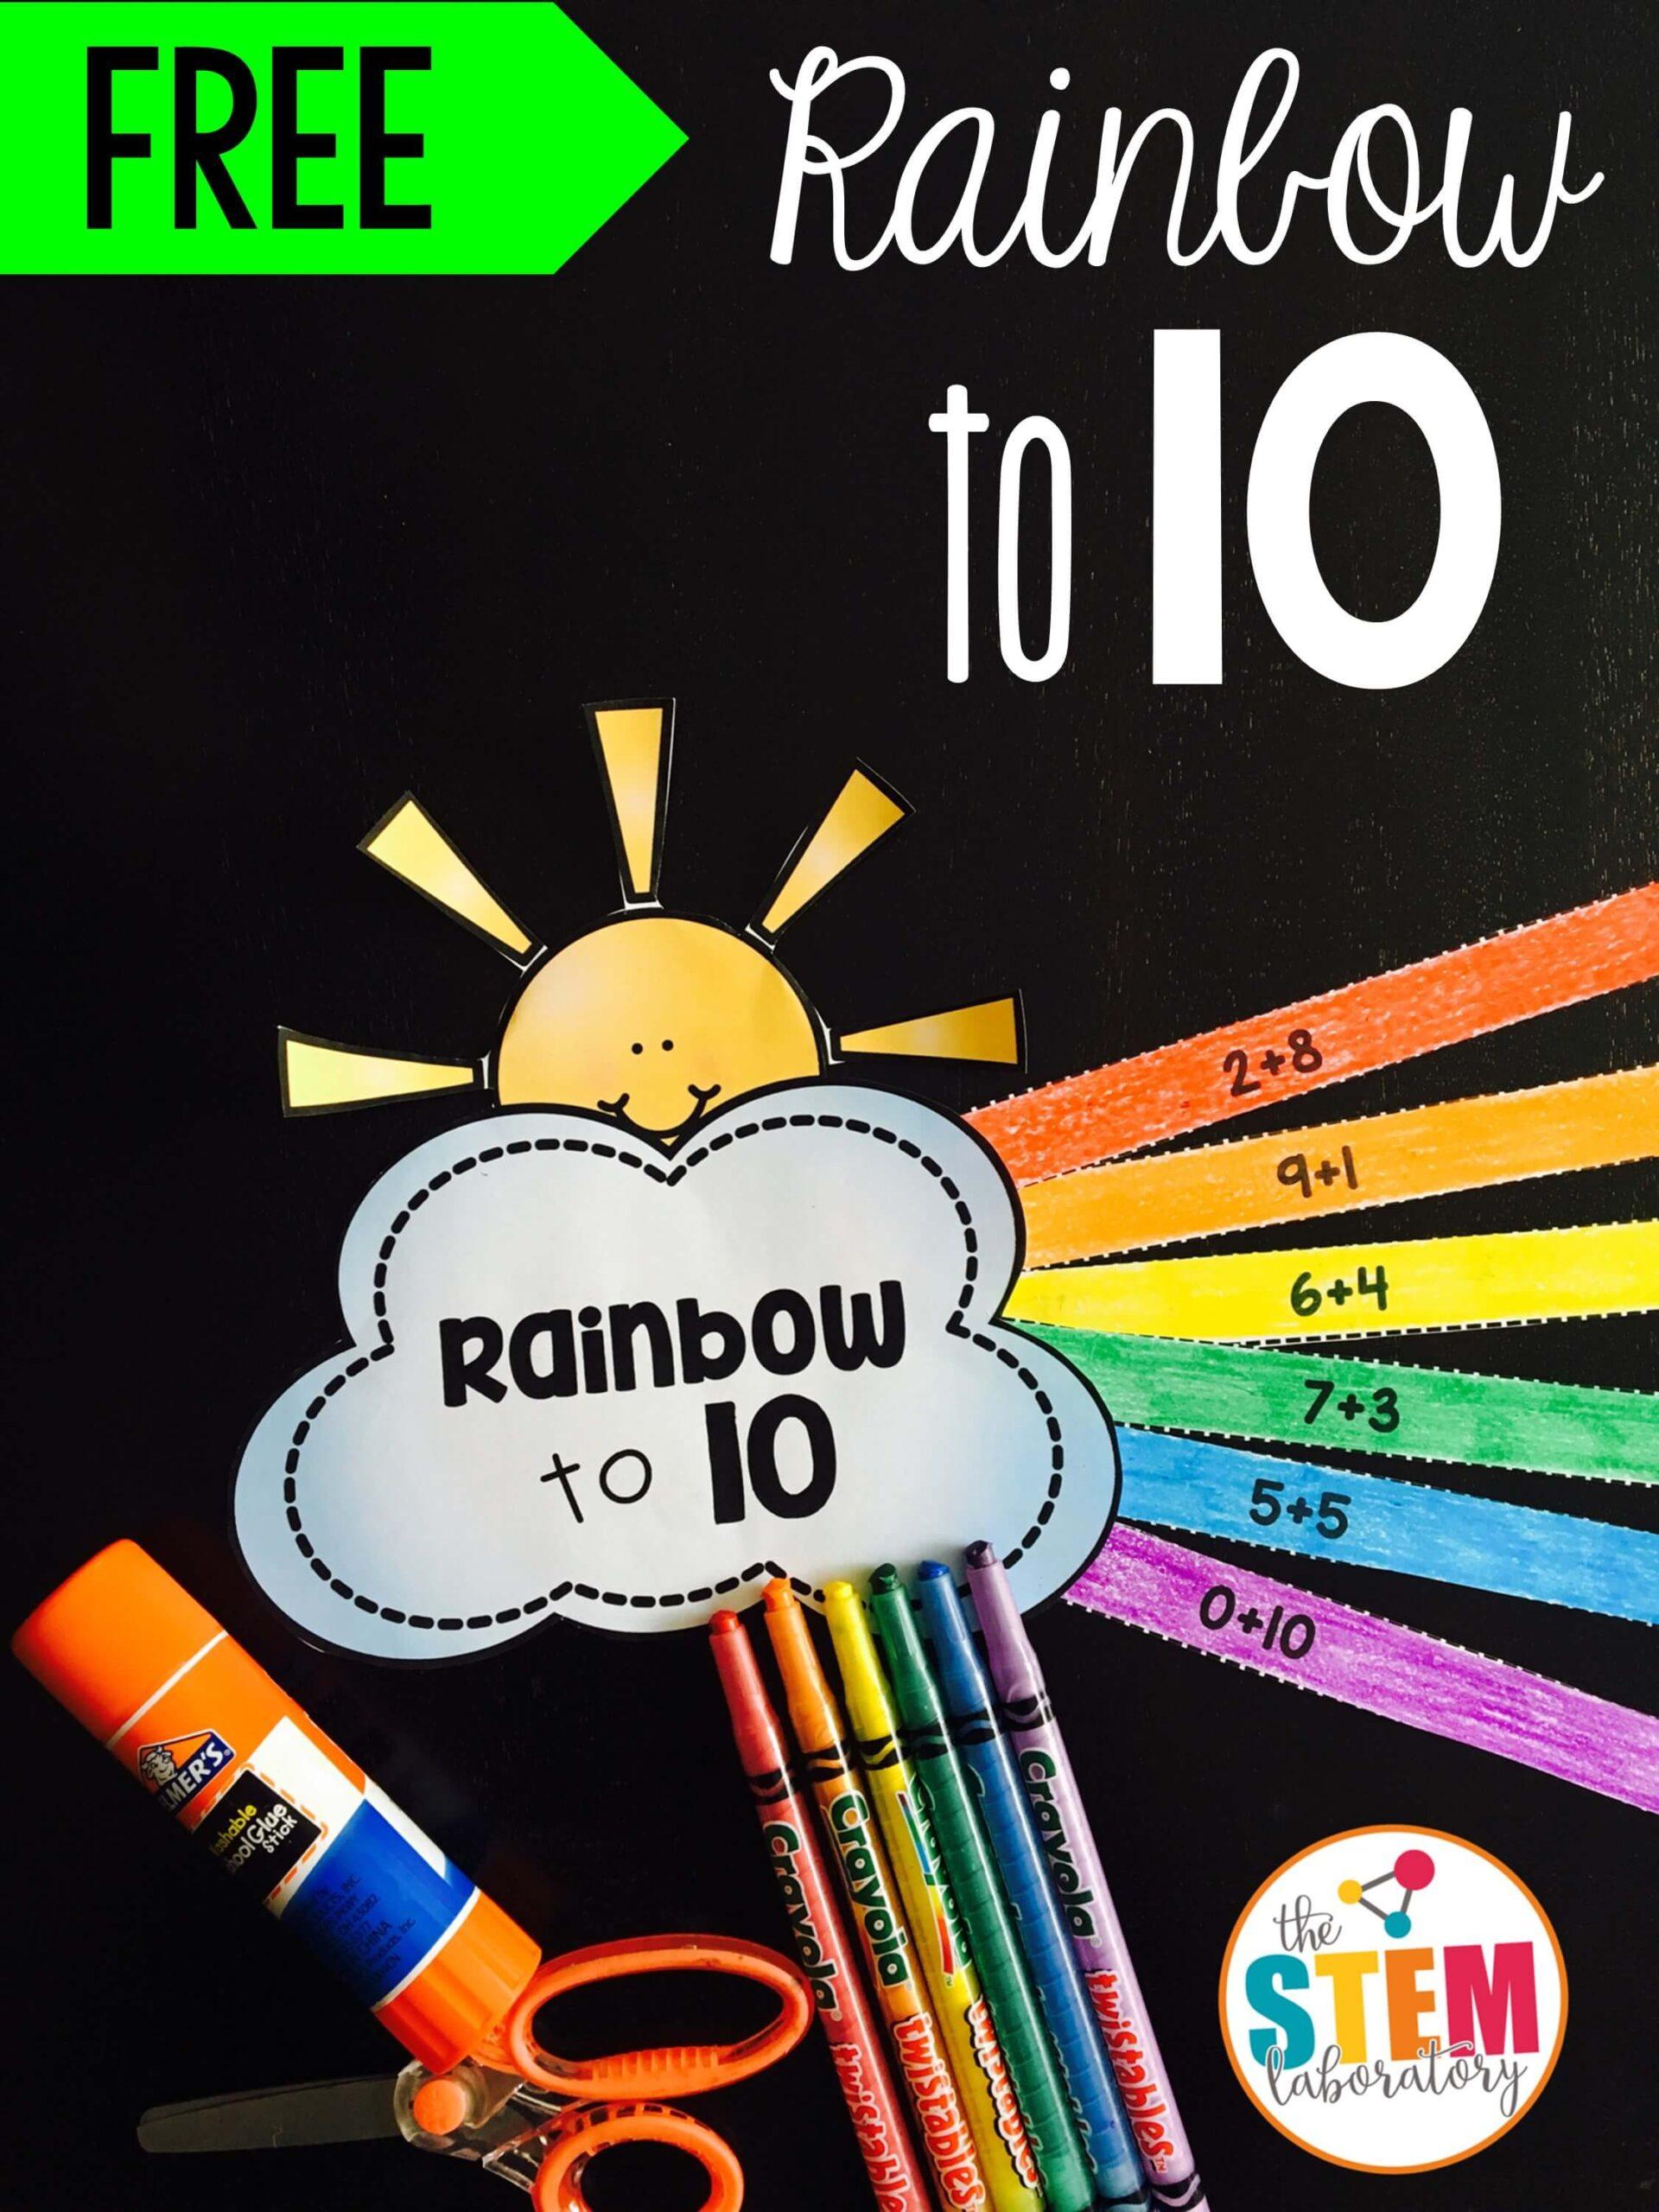 Rainbow to 10